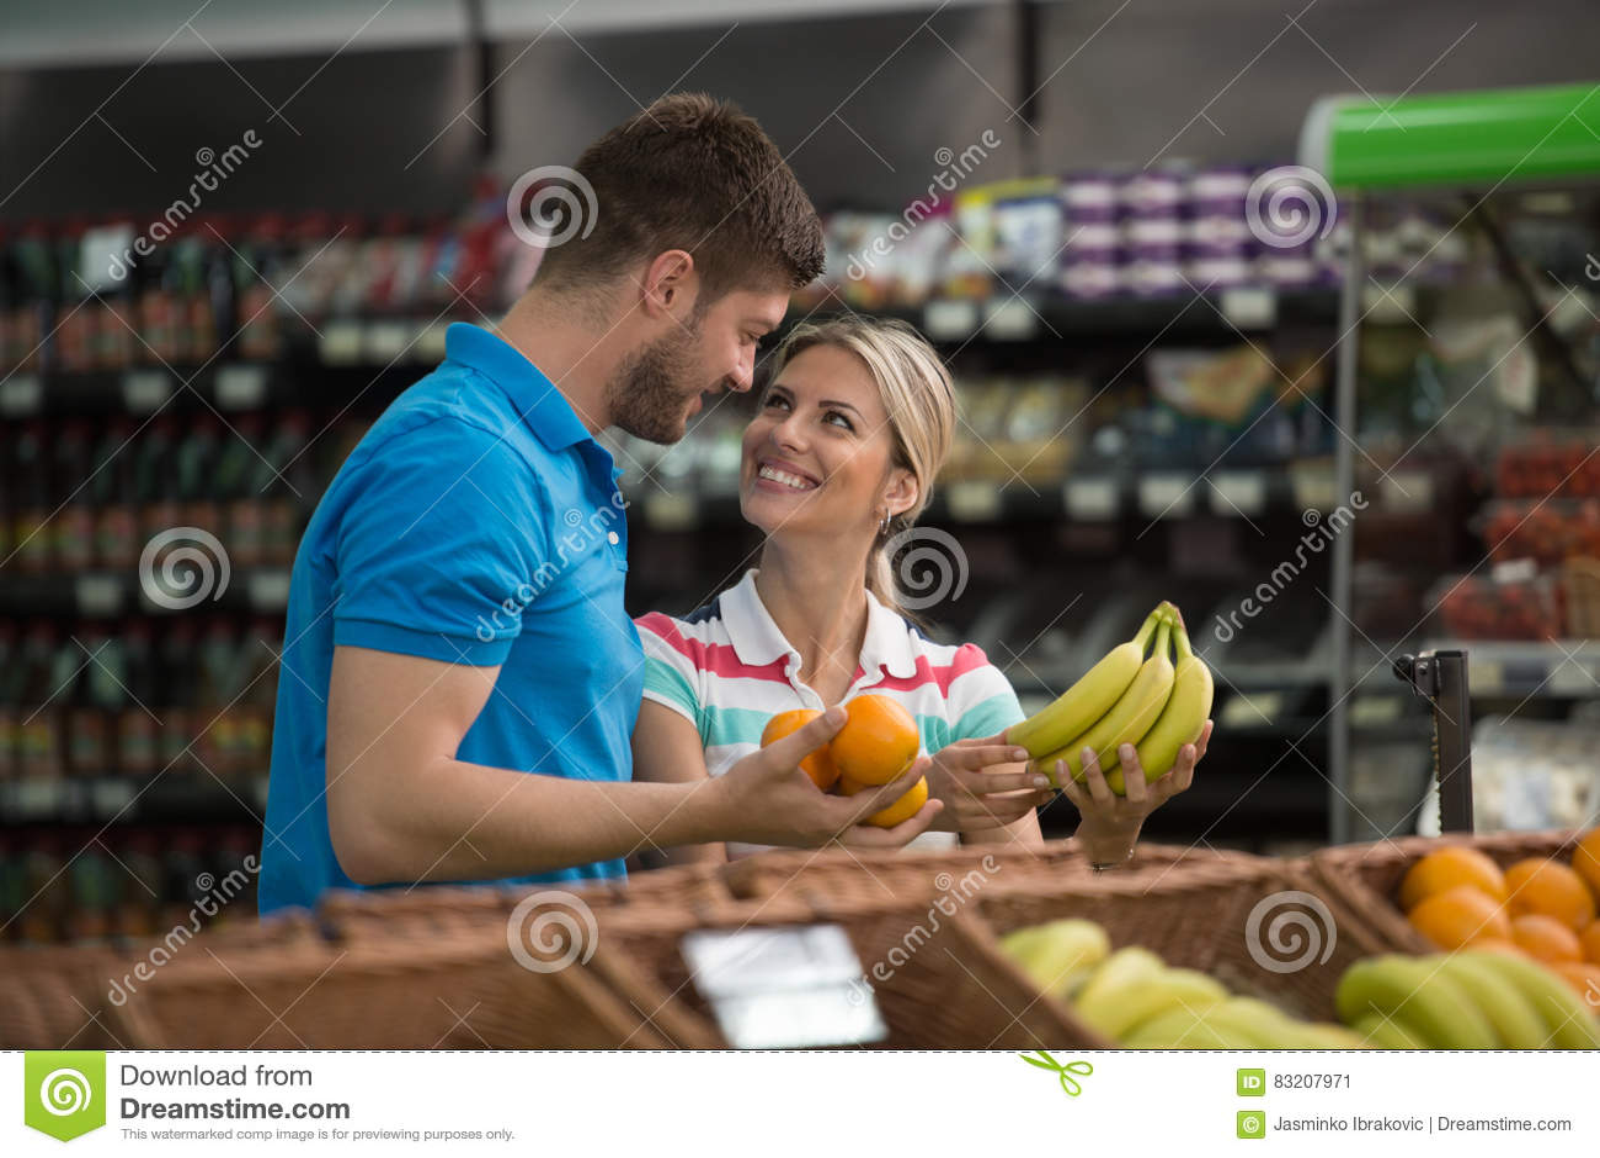 banana supermarket dating)